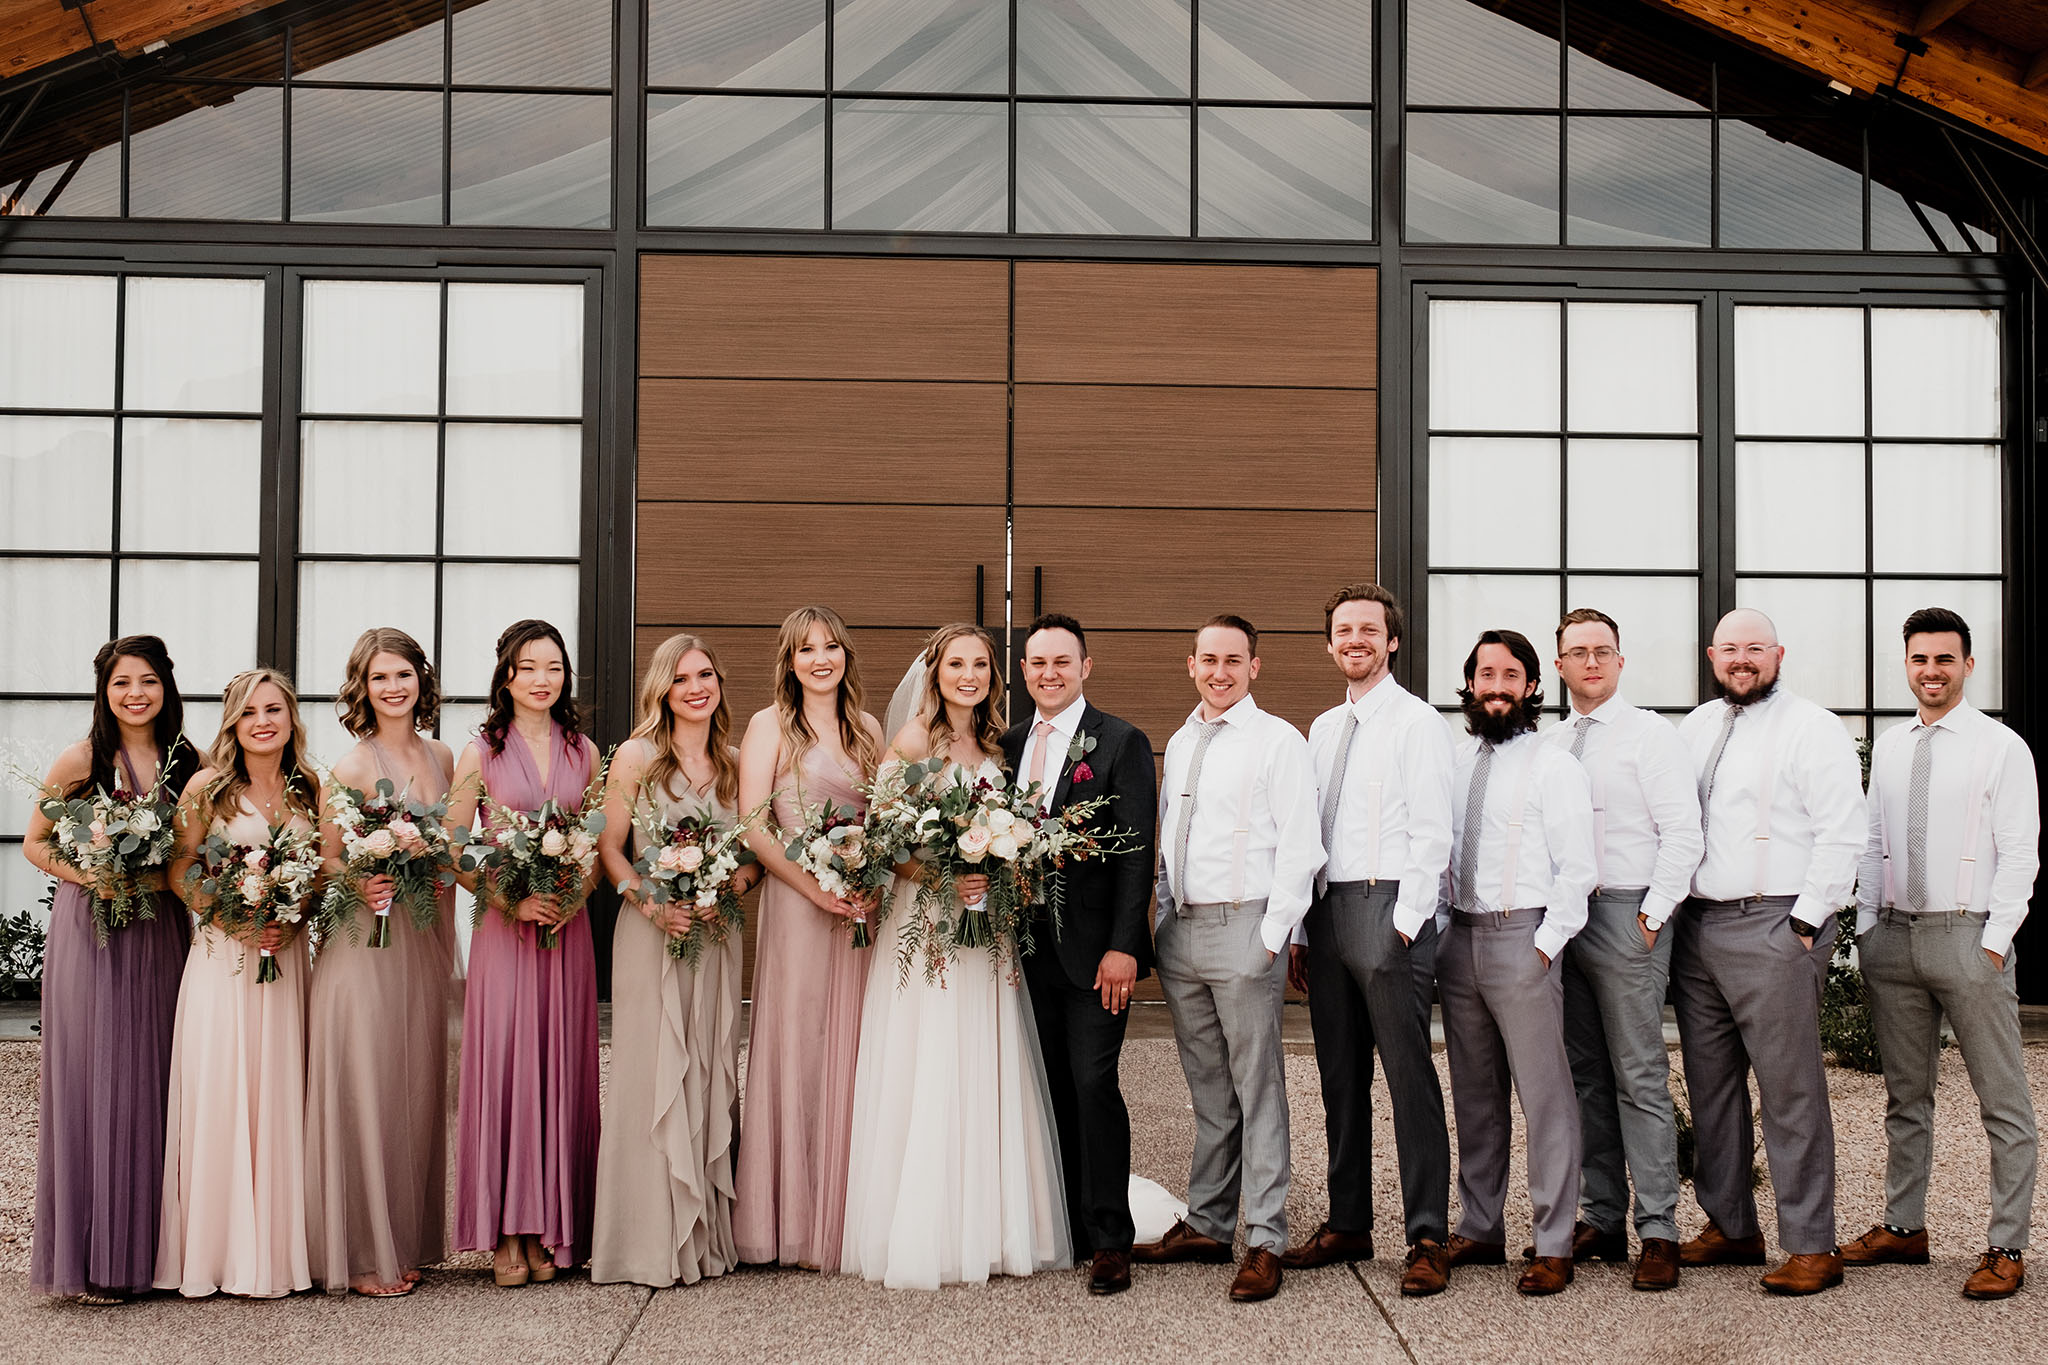 Arizona-Wedding-Photographer-The-Paseo-Venue4.jpg